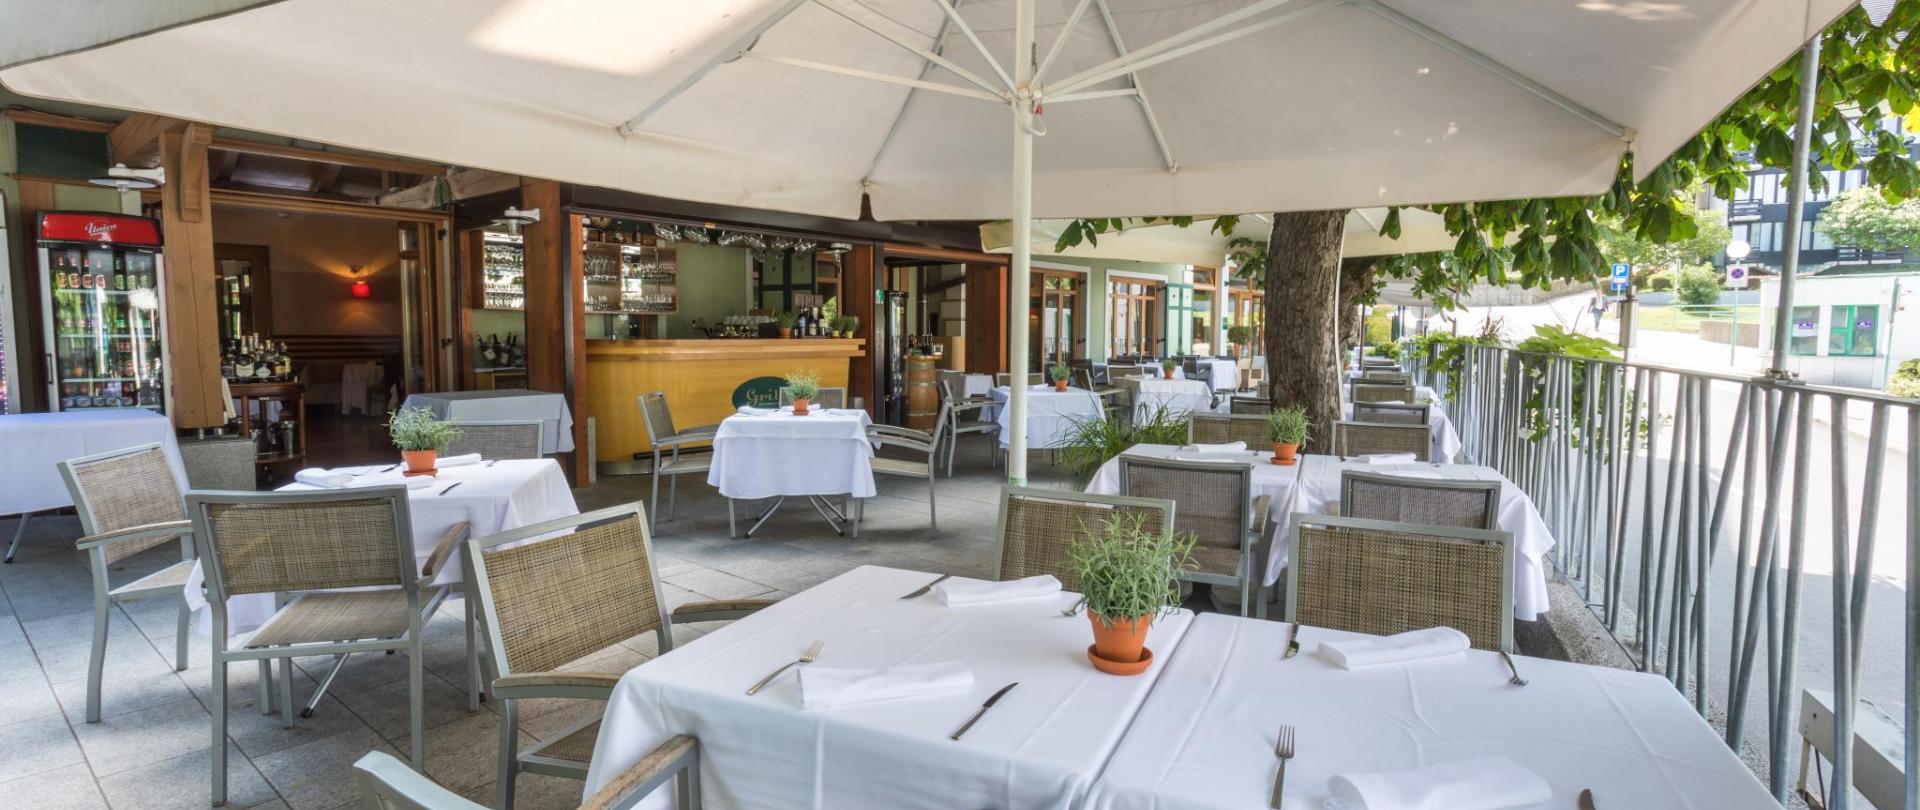 Best Western Premier Hotel Lovec - Grill Lovec Restaurant Terrace